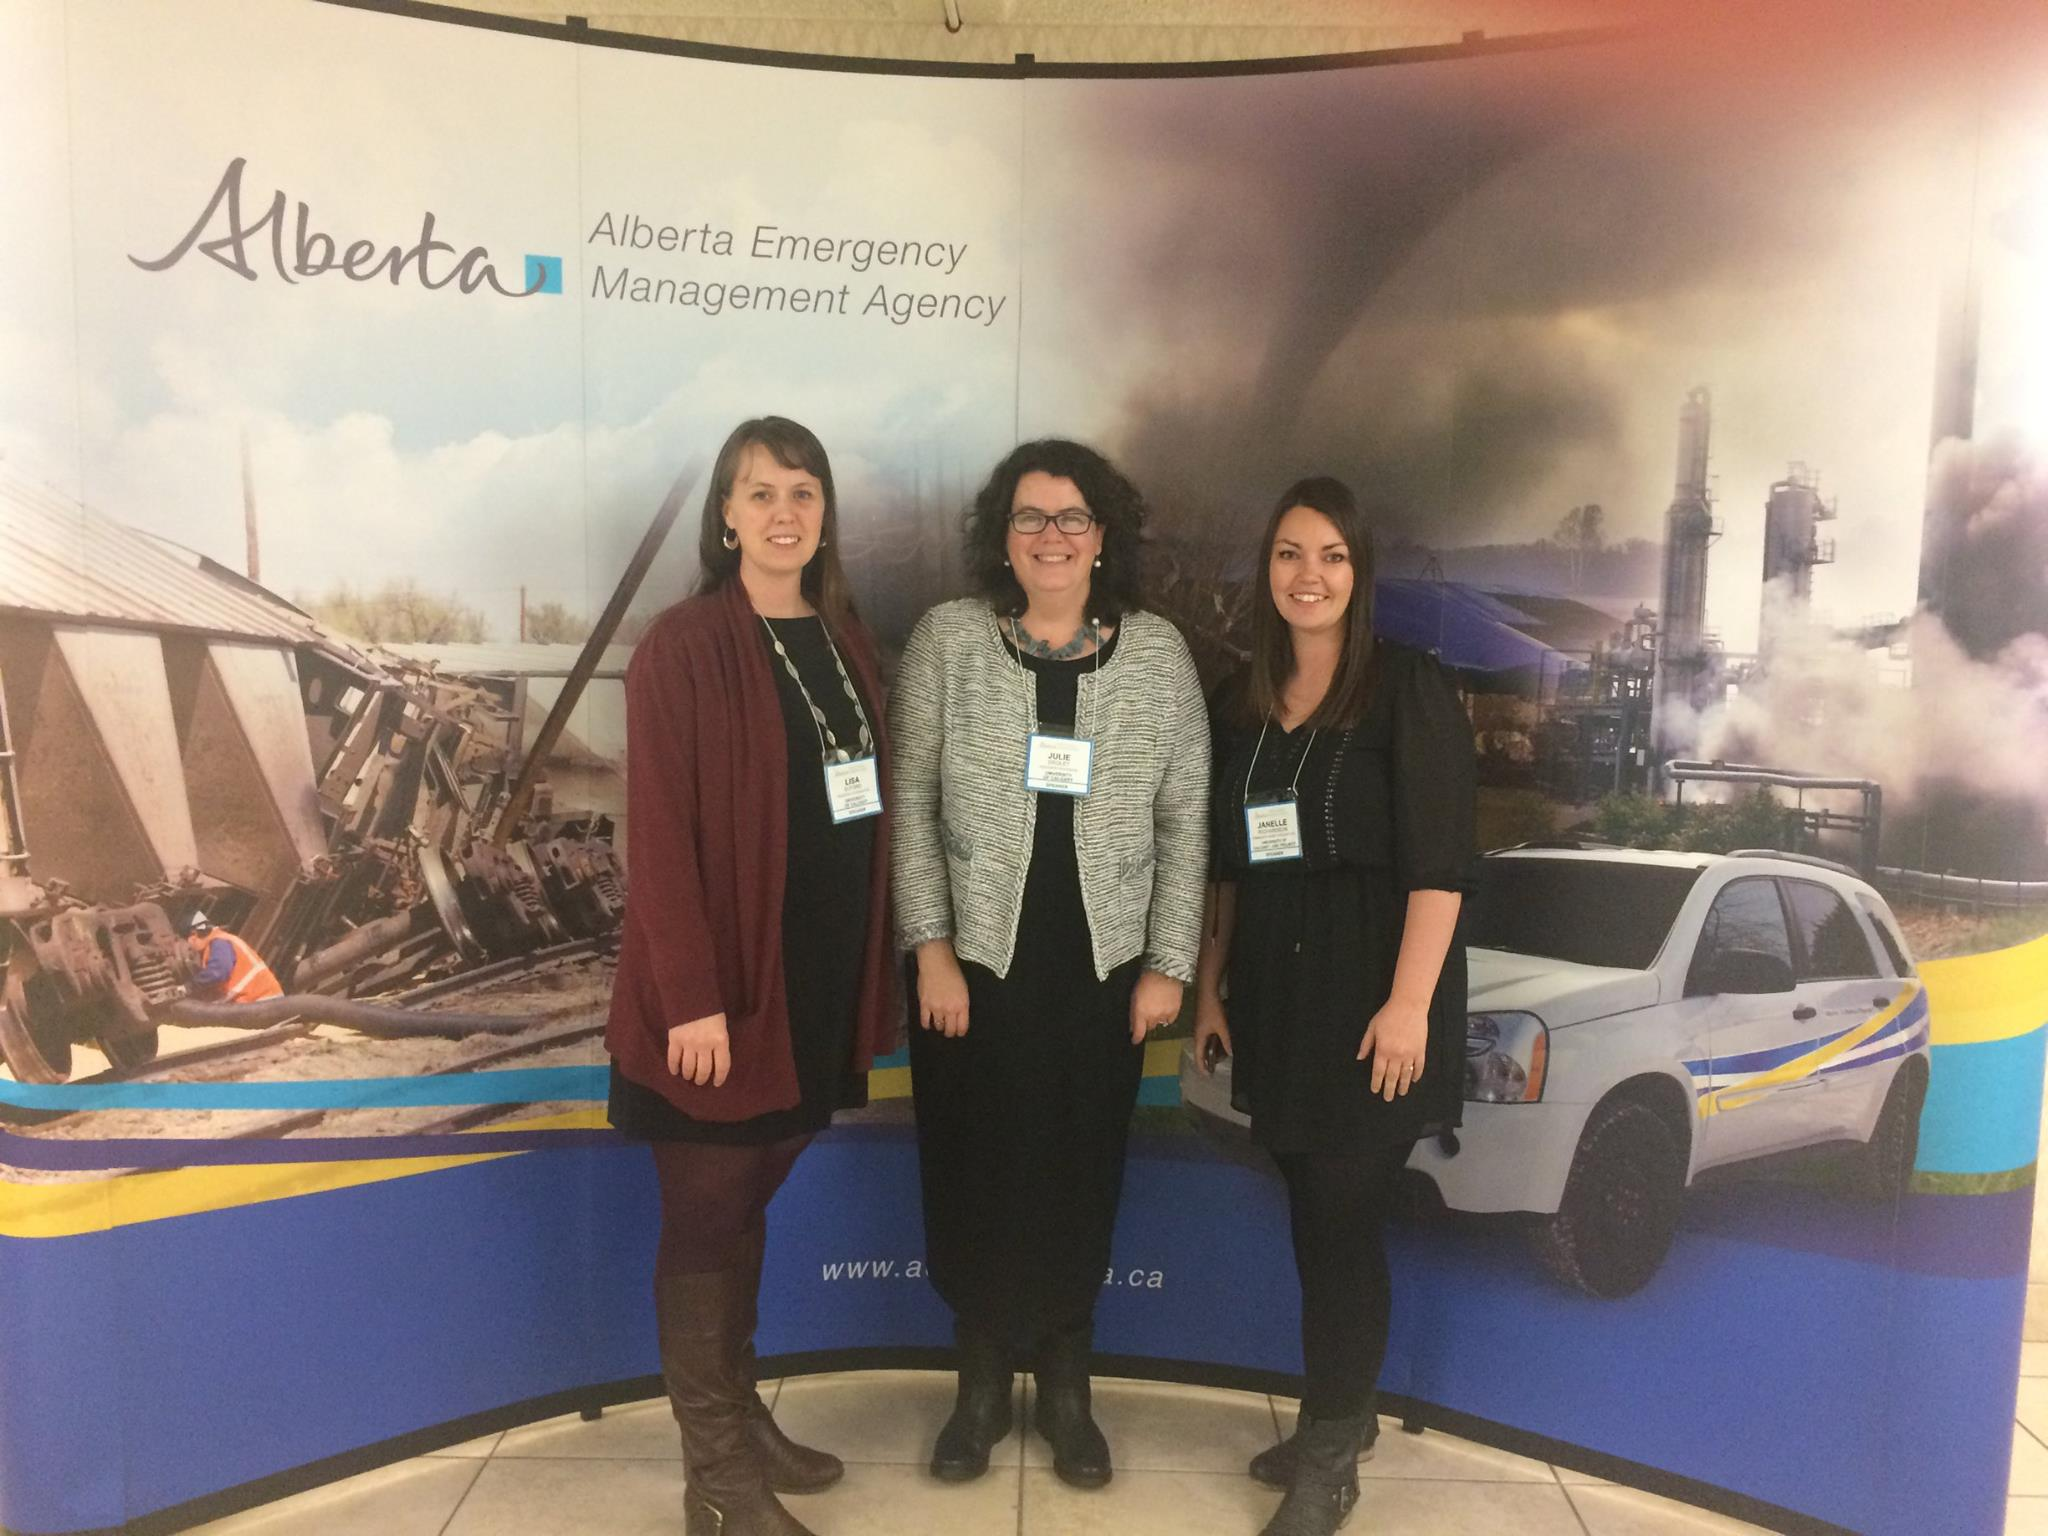 Alberta Emergency Management Agency Summit 2